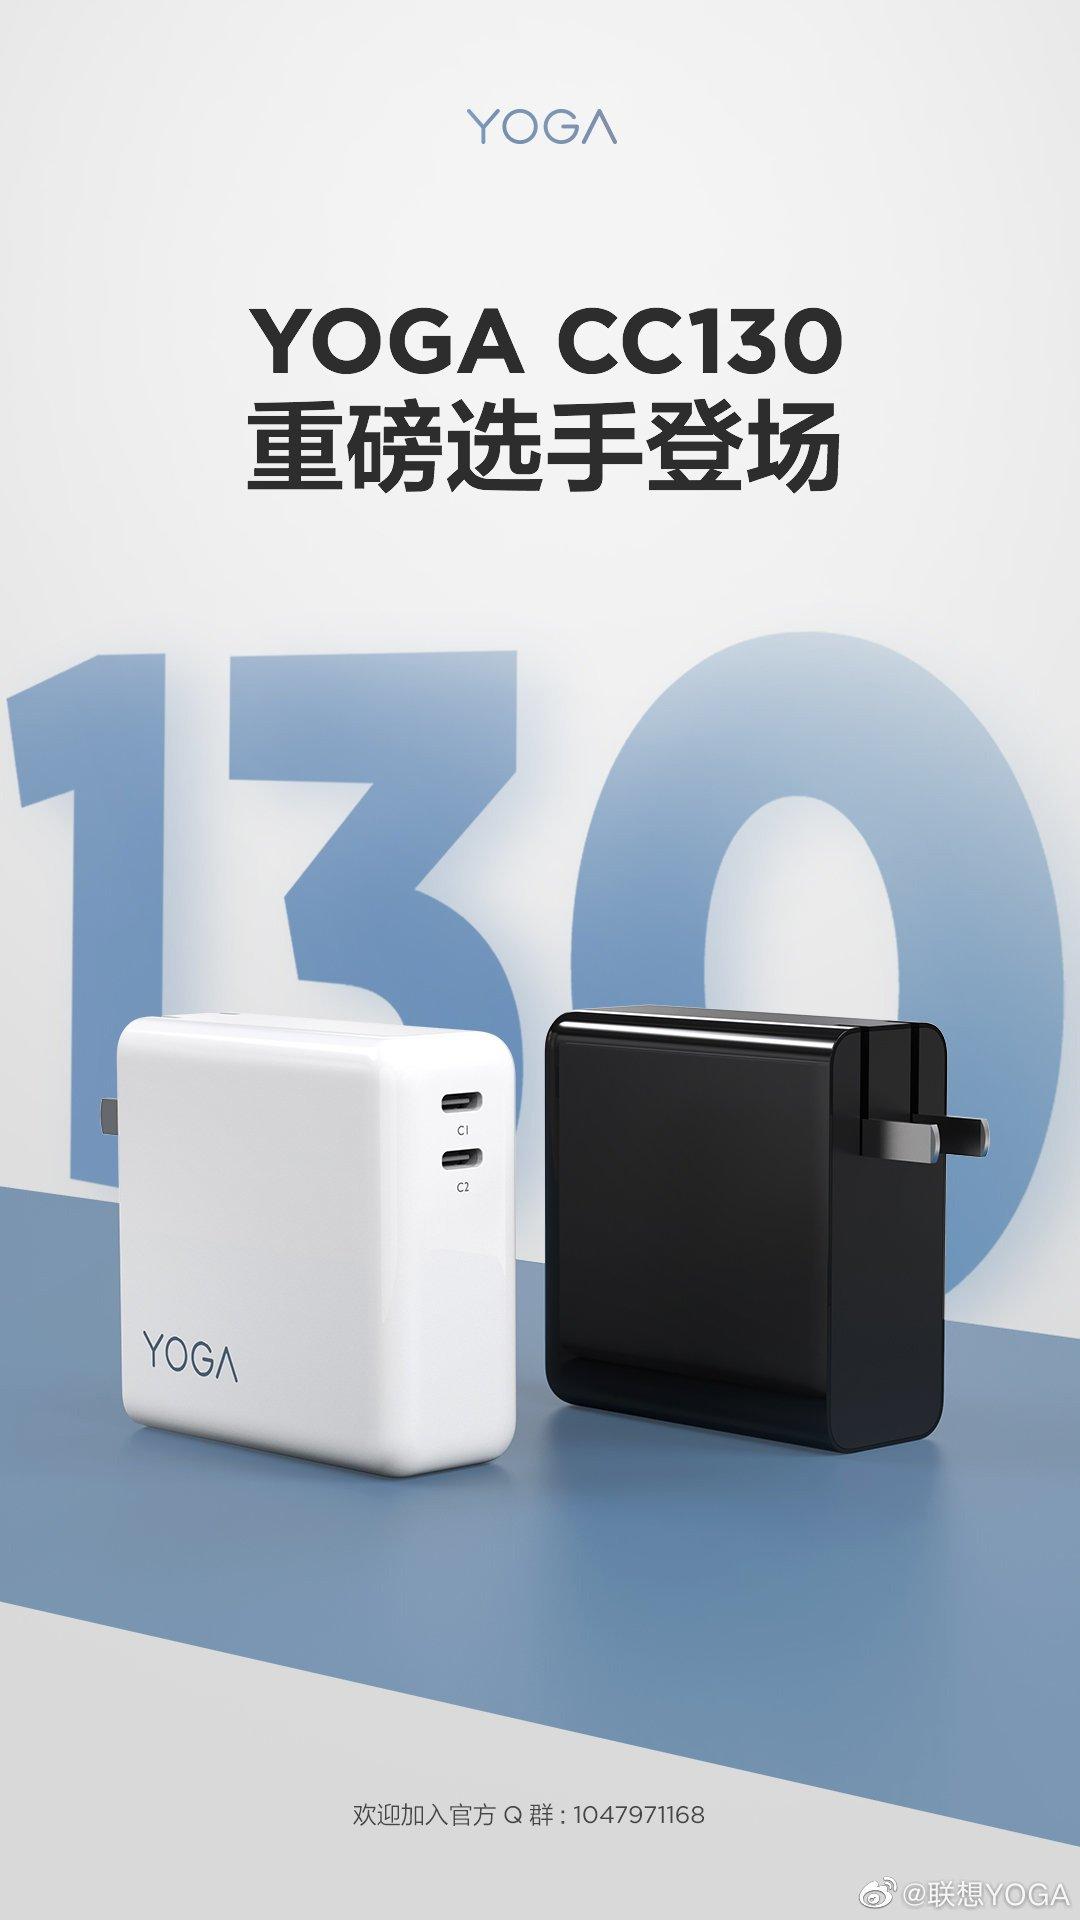 YOGA CC130 charger